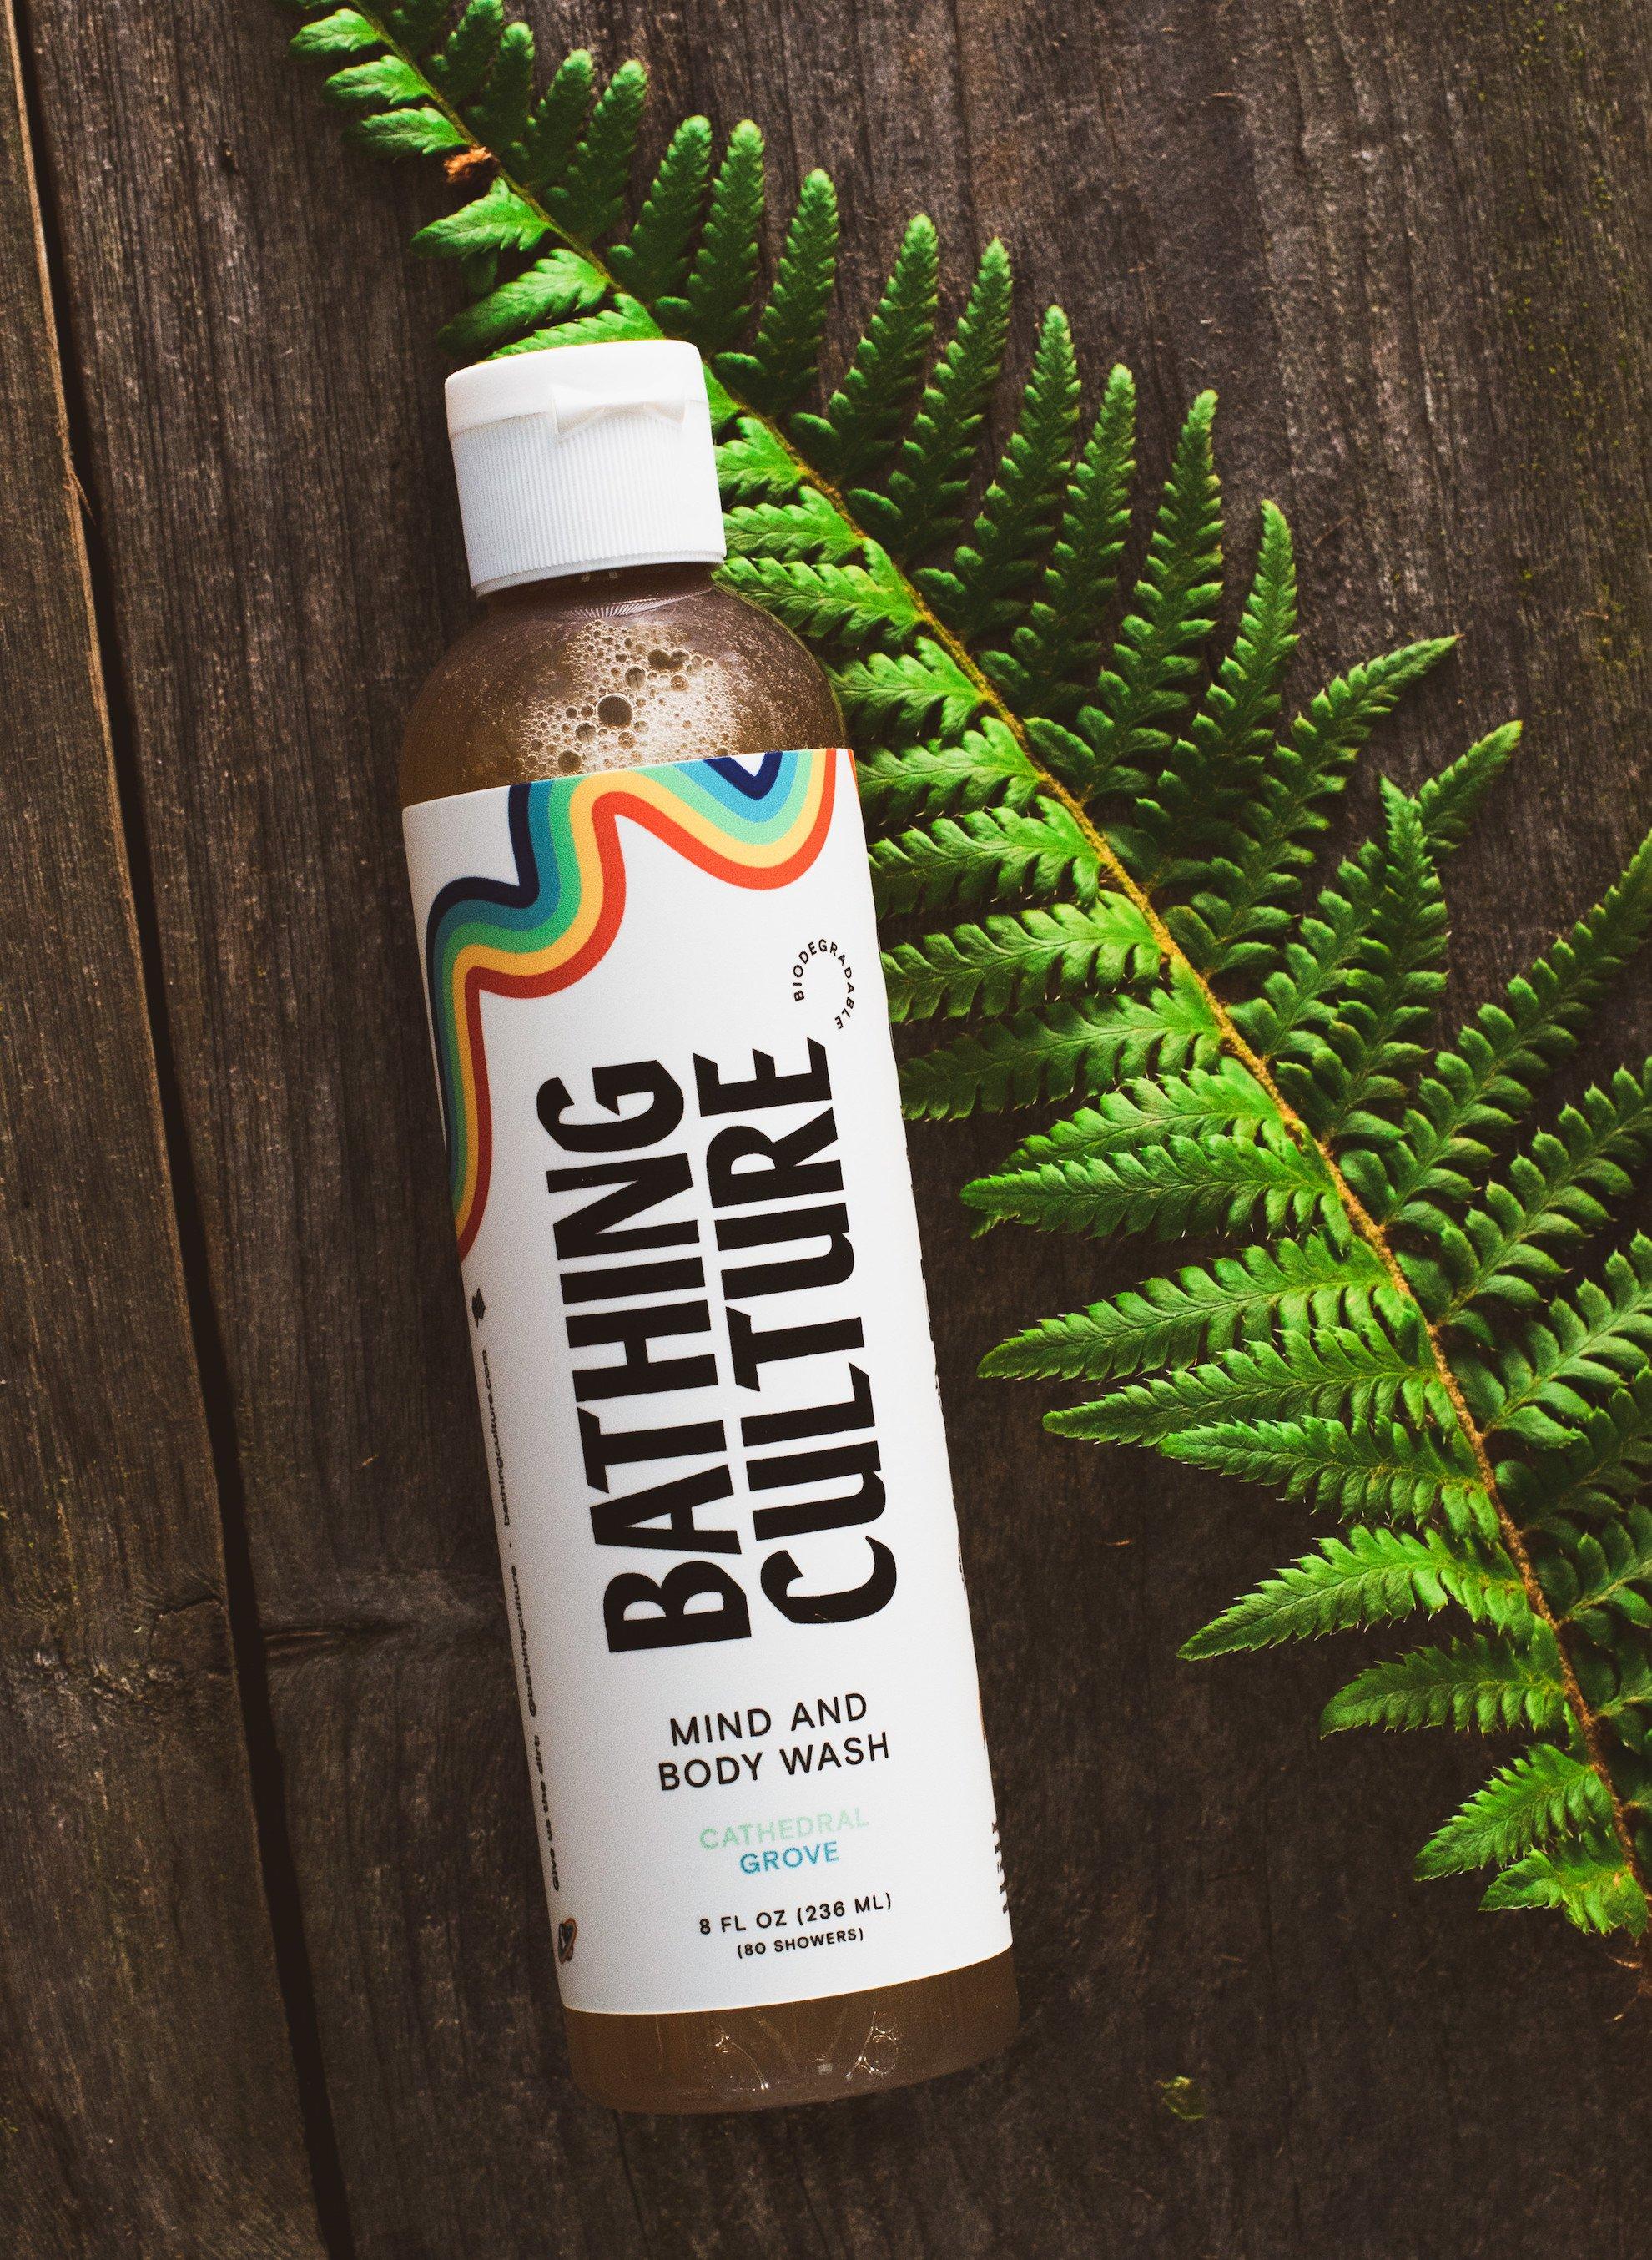 Made by a friend in SF, Bathing Culture's bodywash is a true unisex shower hero.